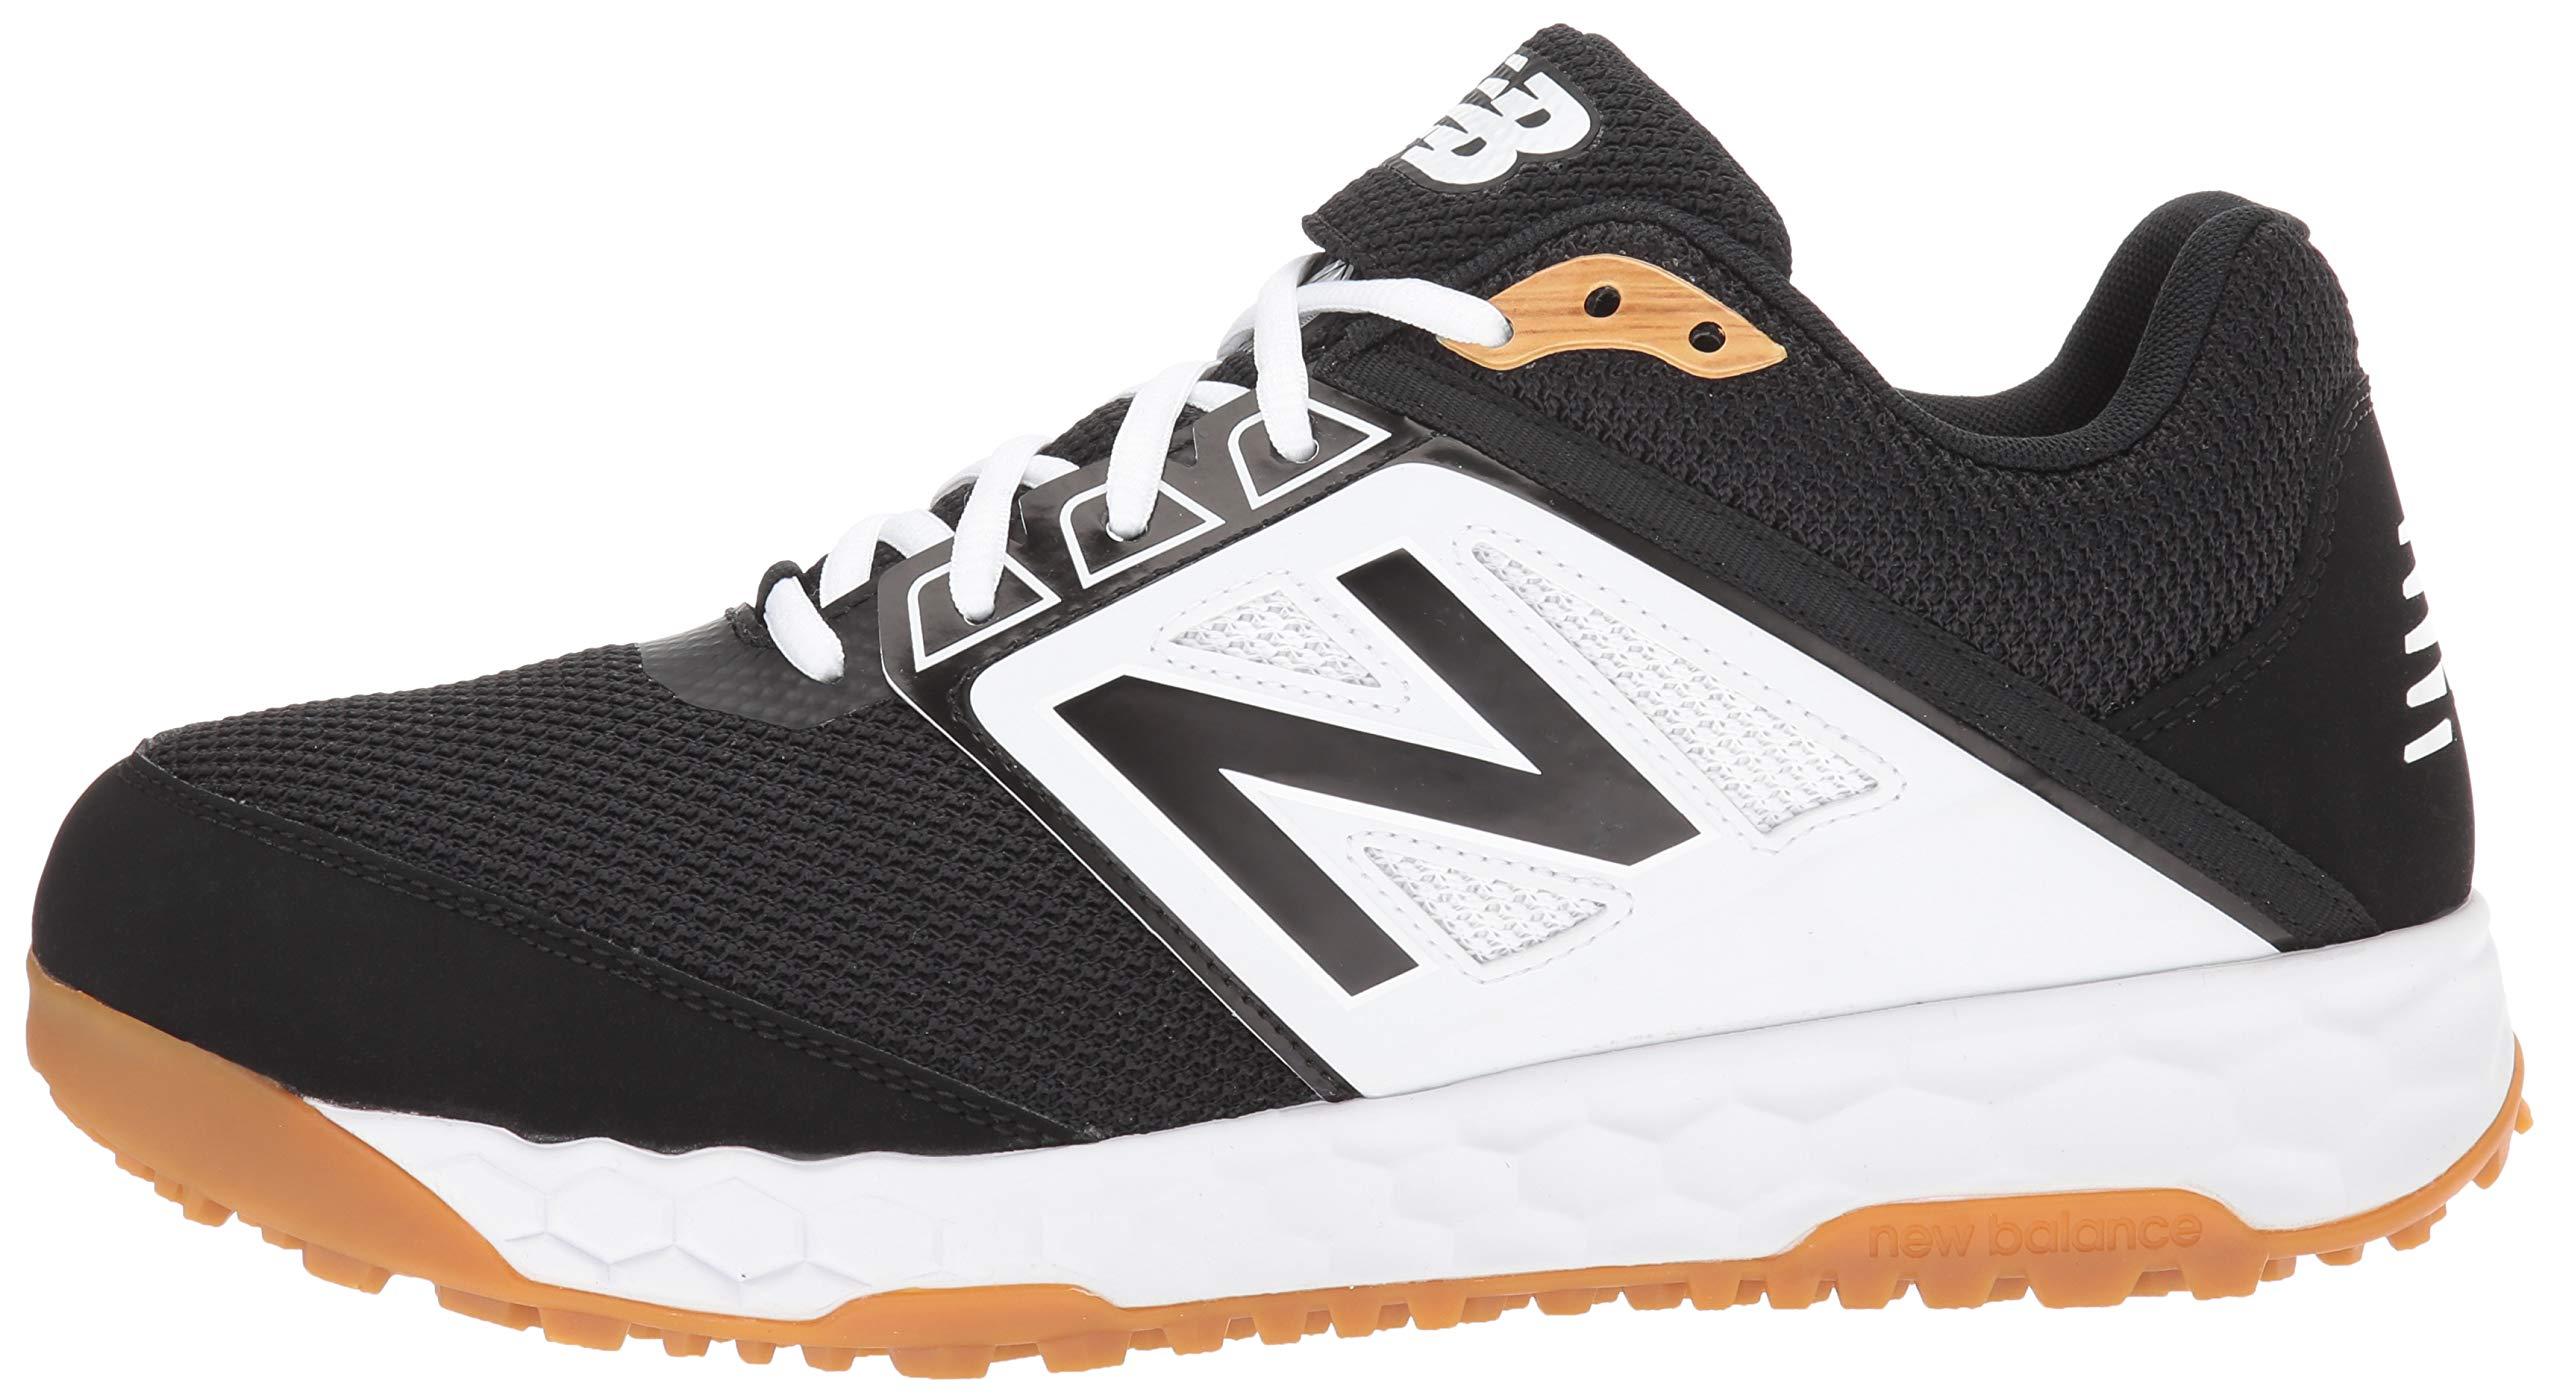 New Balance Men's 3000v4 Turf Baseball Shoe, Black/White, 5 D US by New Balance (Image #5)